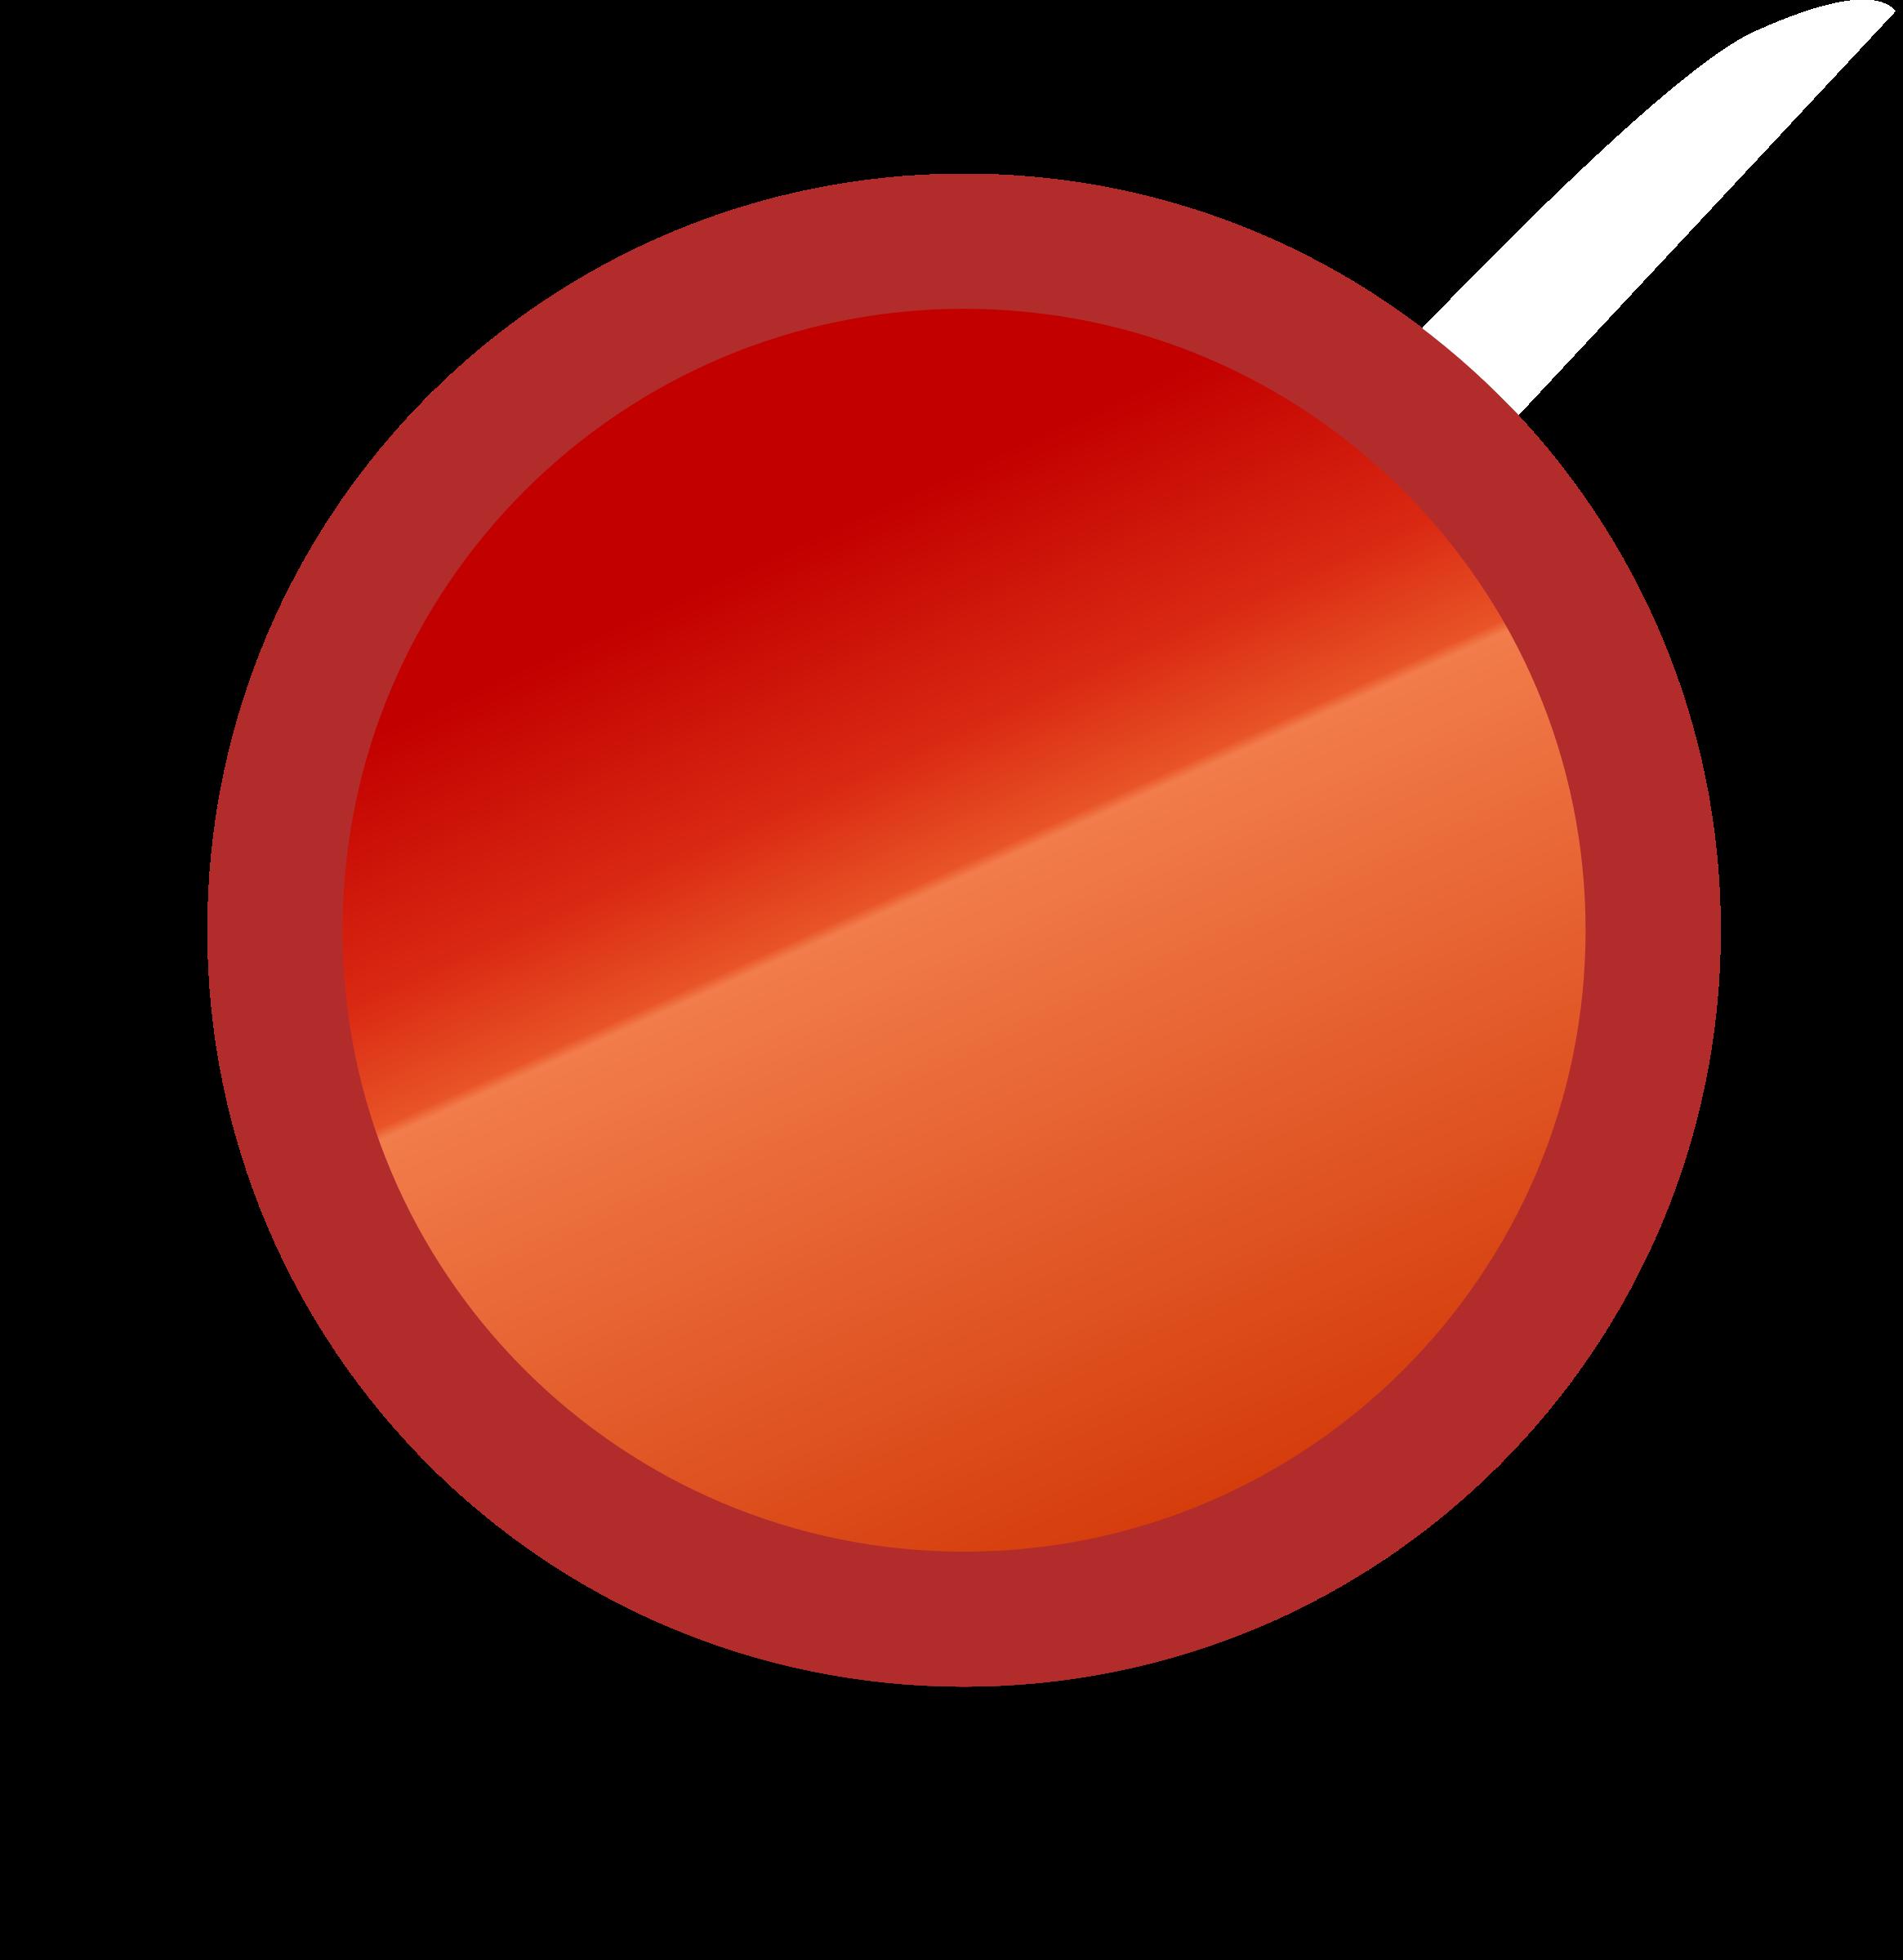 Big image png. Circle clipart peach